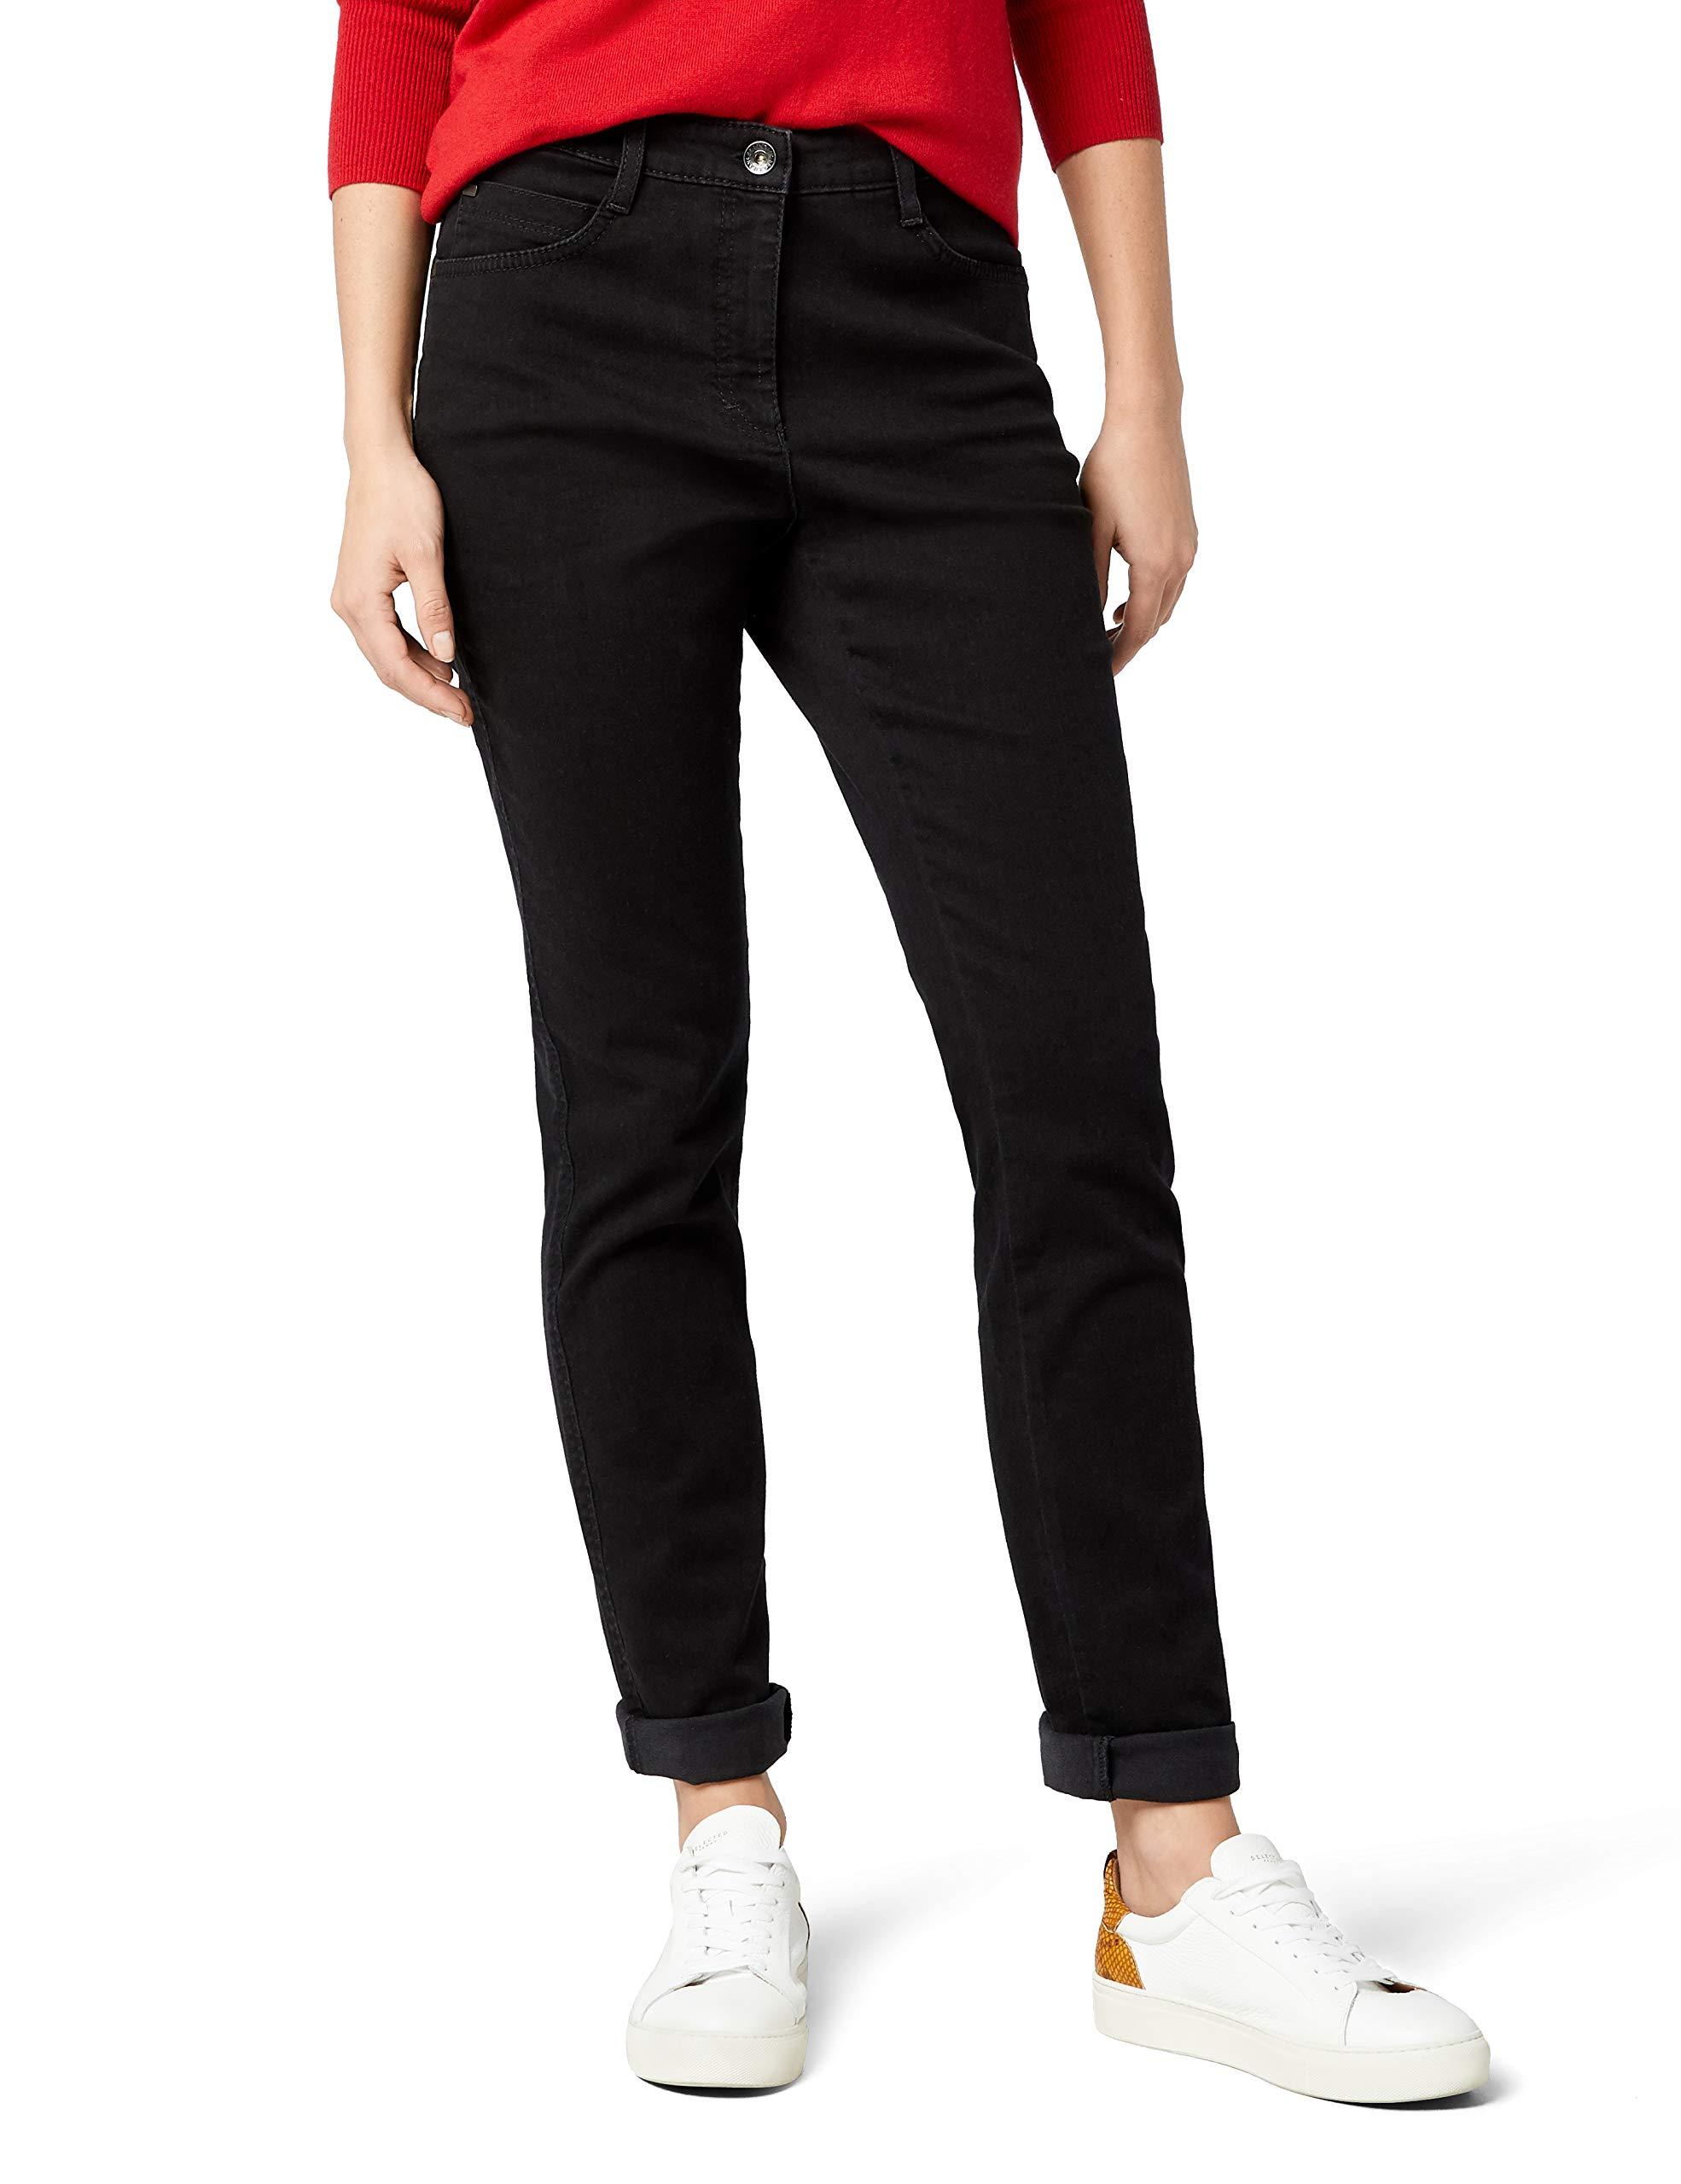 Femme 227 JeansNoir 30 Black amp;nbspw Brax 70 3000Mary schwarzclean amp;nbspl XwOkZiPuT